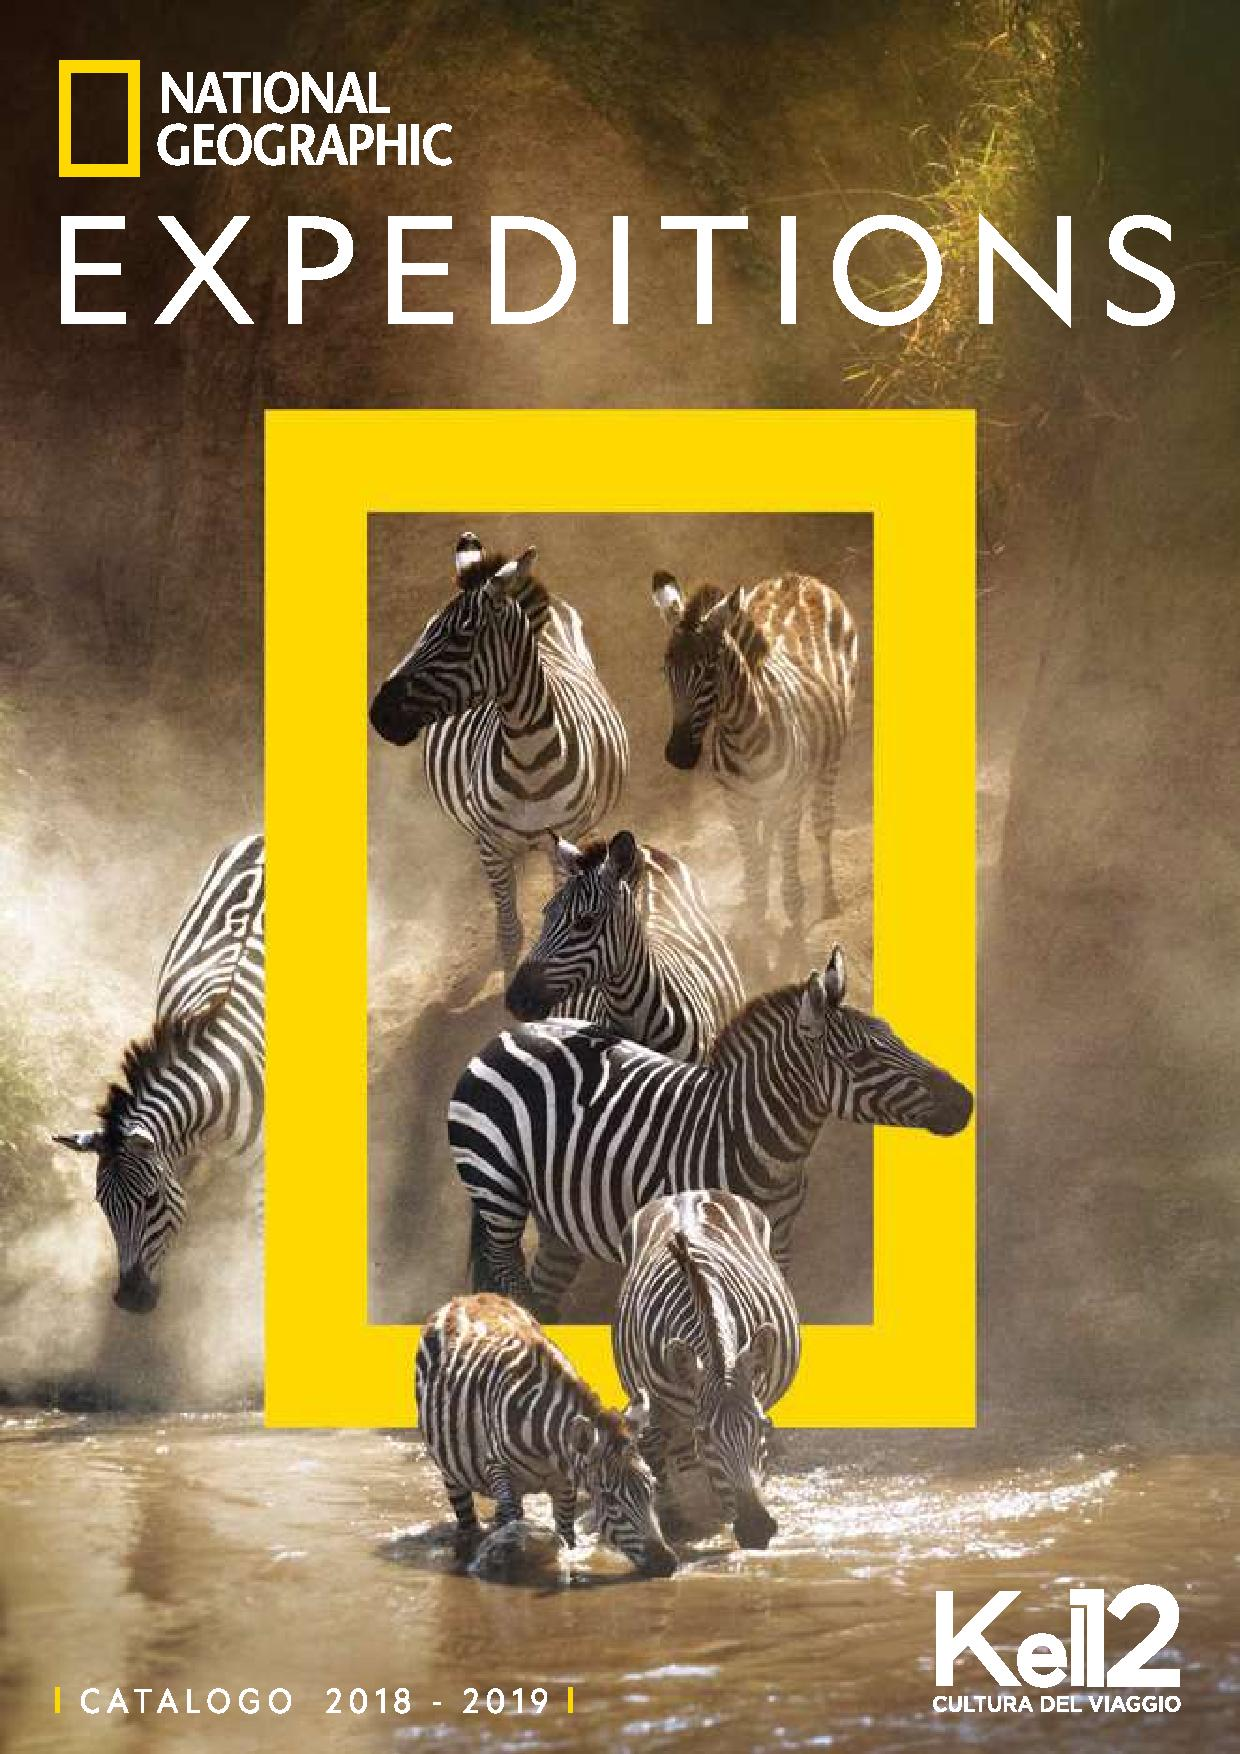 Kel 12 Calendario Viaggi.Kel 12 National Geographic Expeditions Catalogo Viaggi 2018